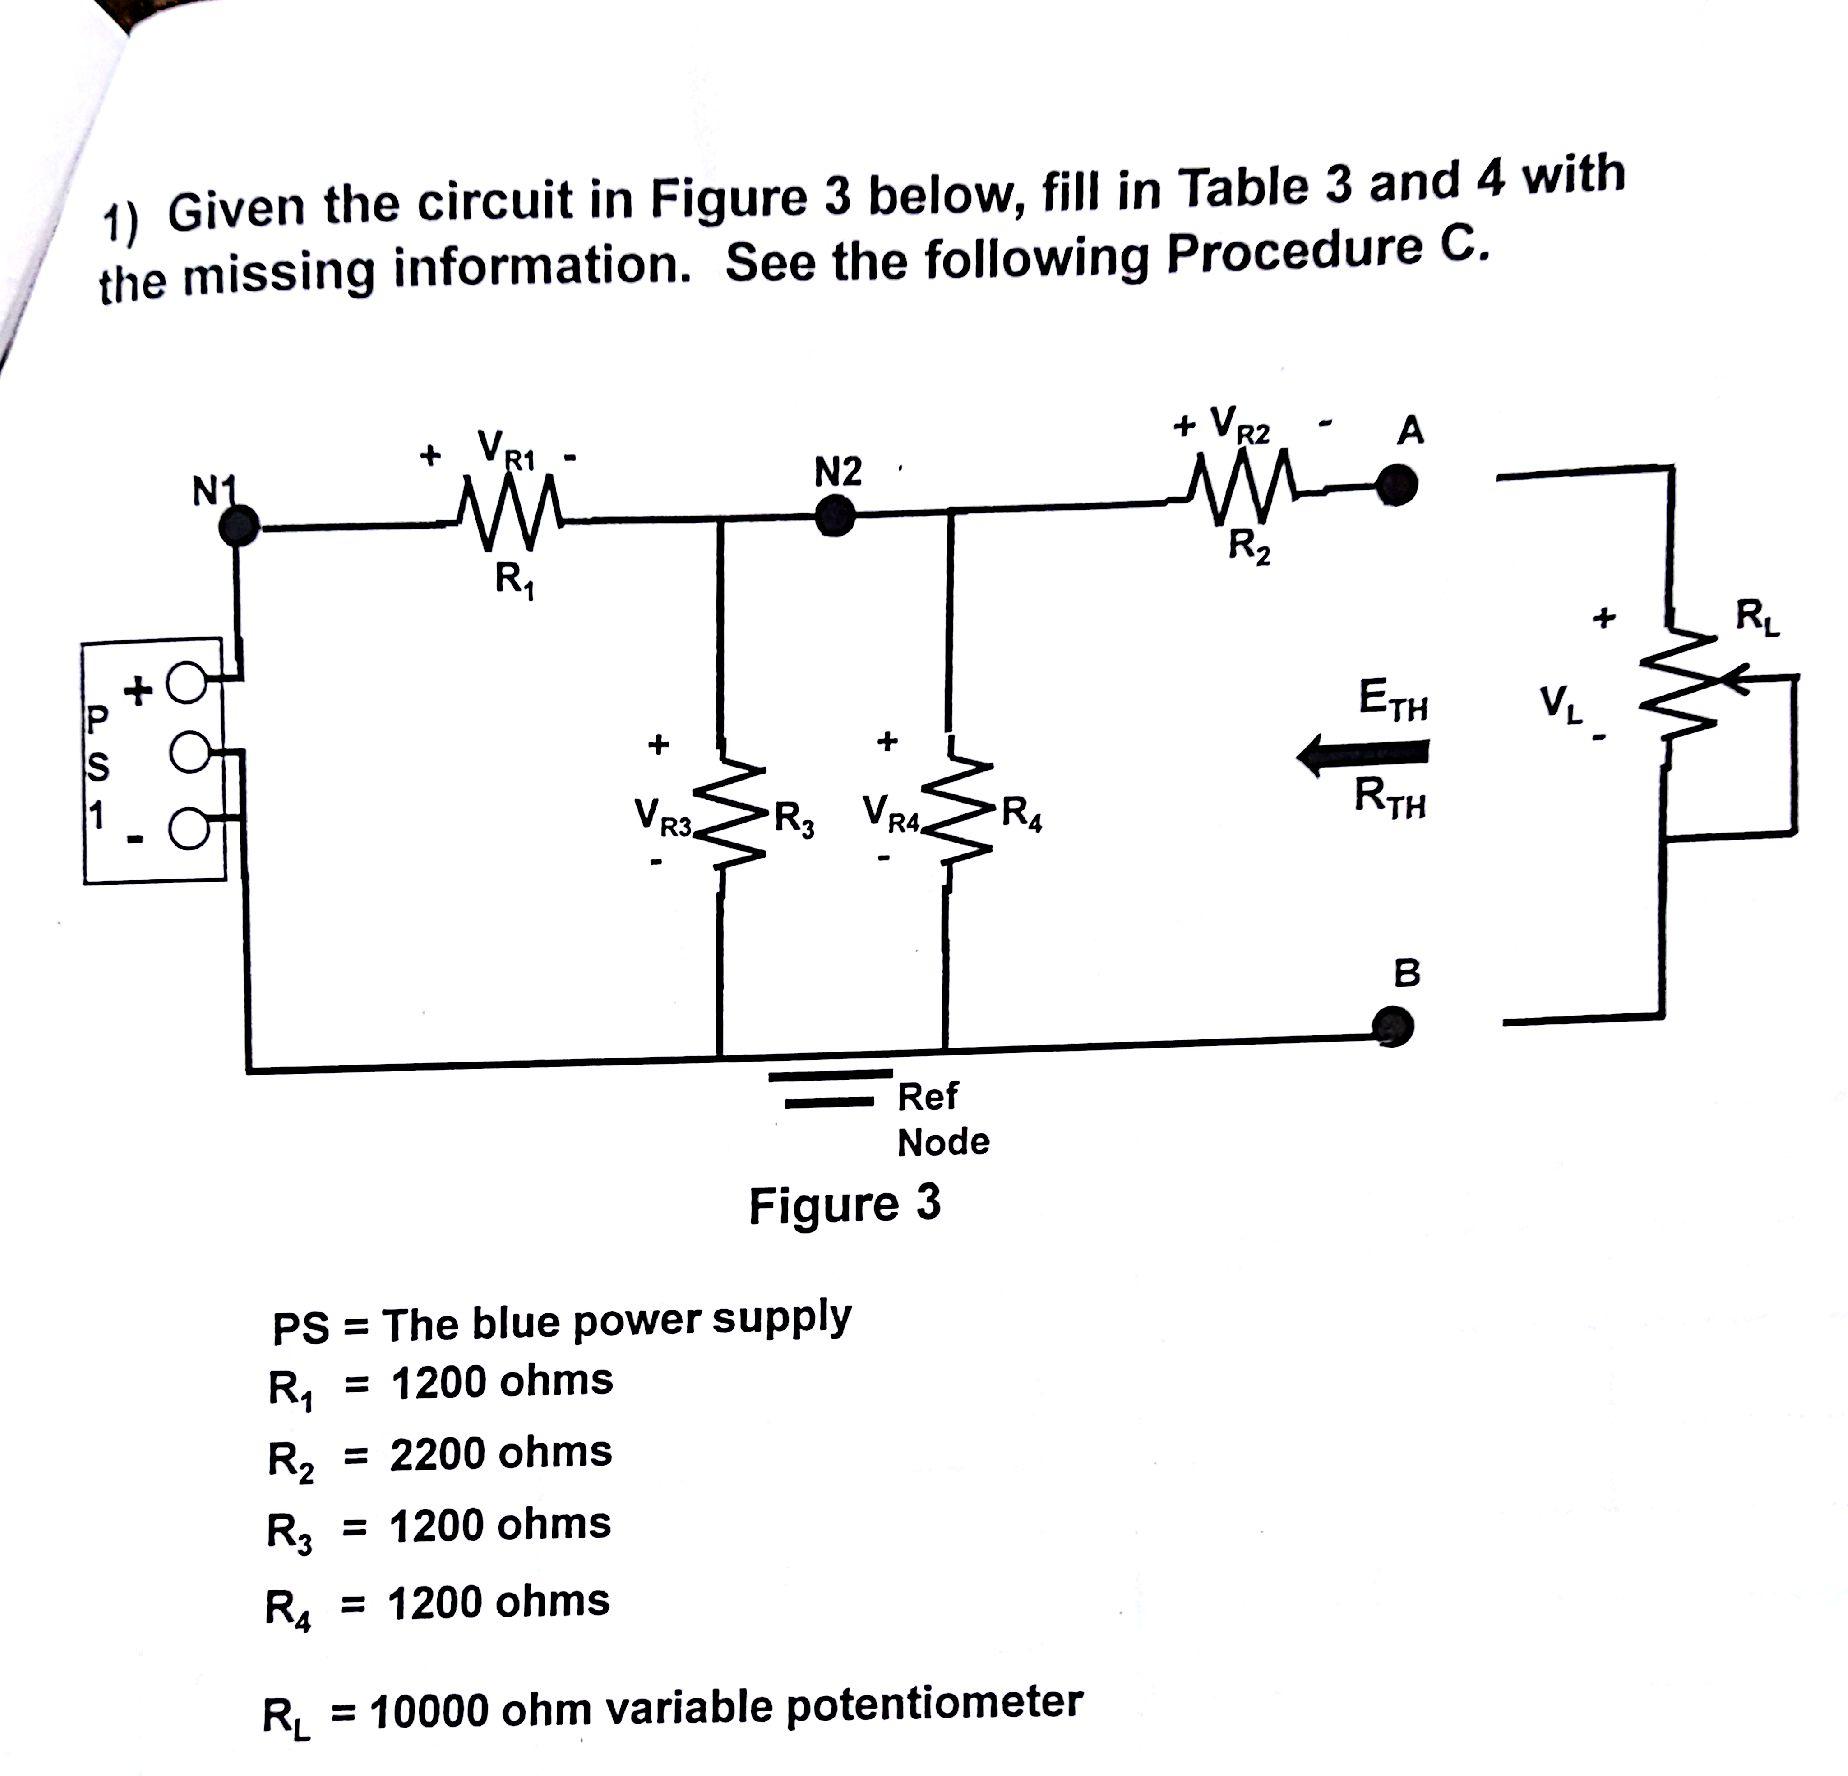 wiringdiagramukwiringagarageconsumerunitdiagramwiringasplitfigure 97 potentiometer circuit new model wiring diagramsolved given the circuit in figure 3 below,